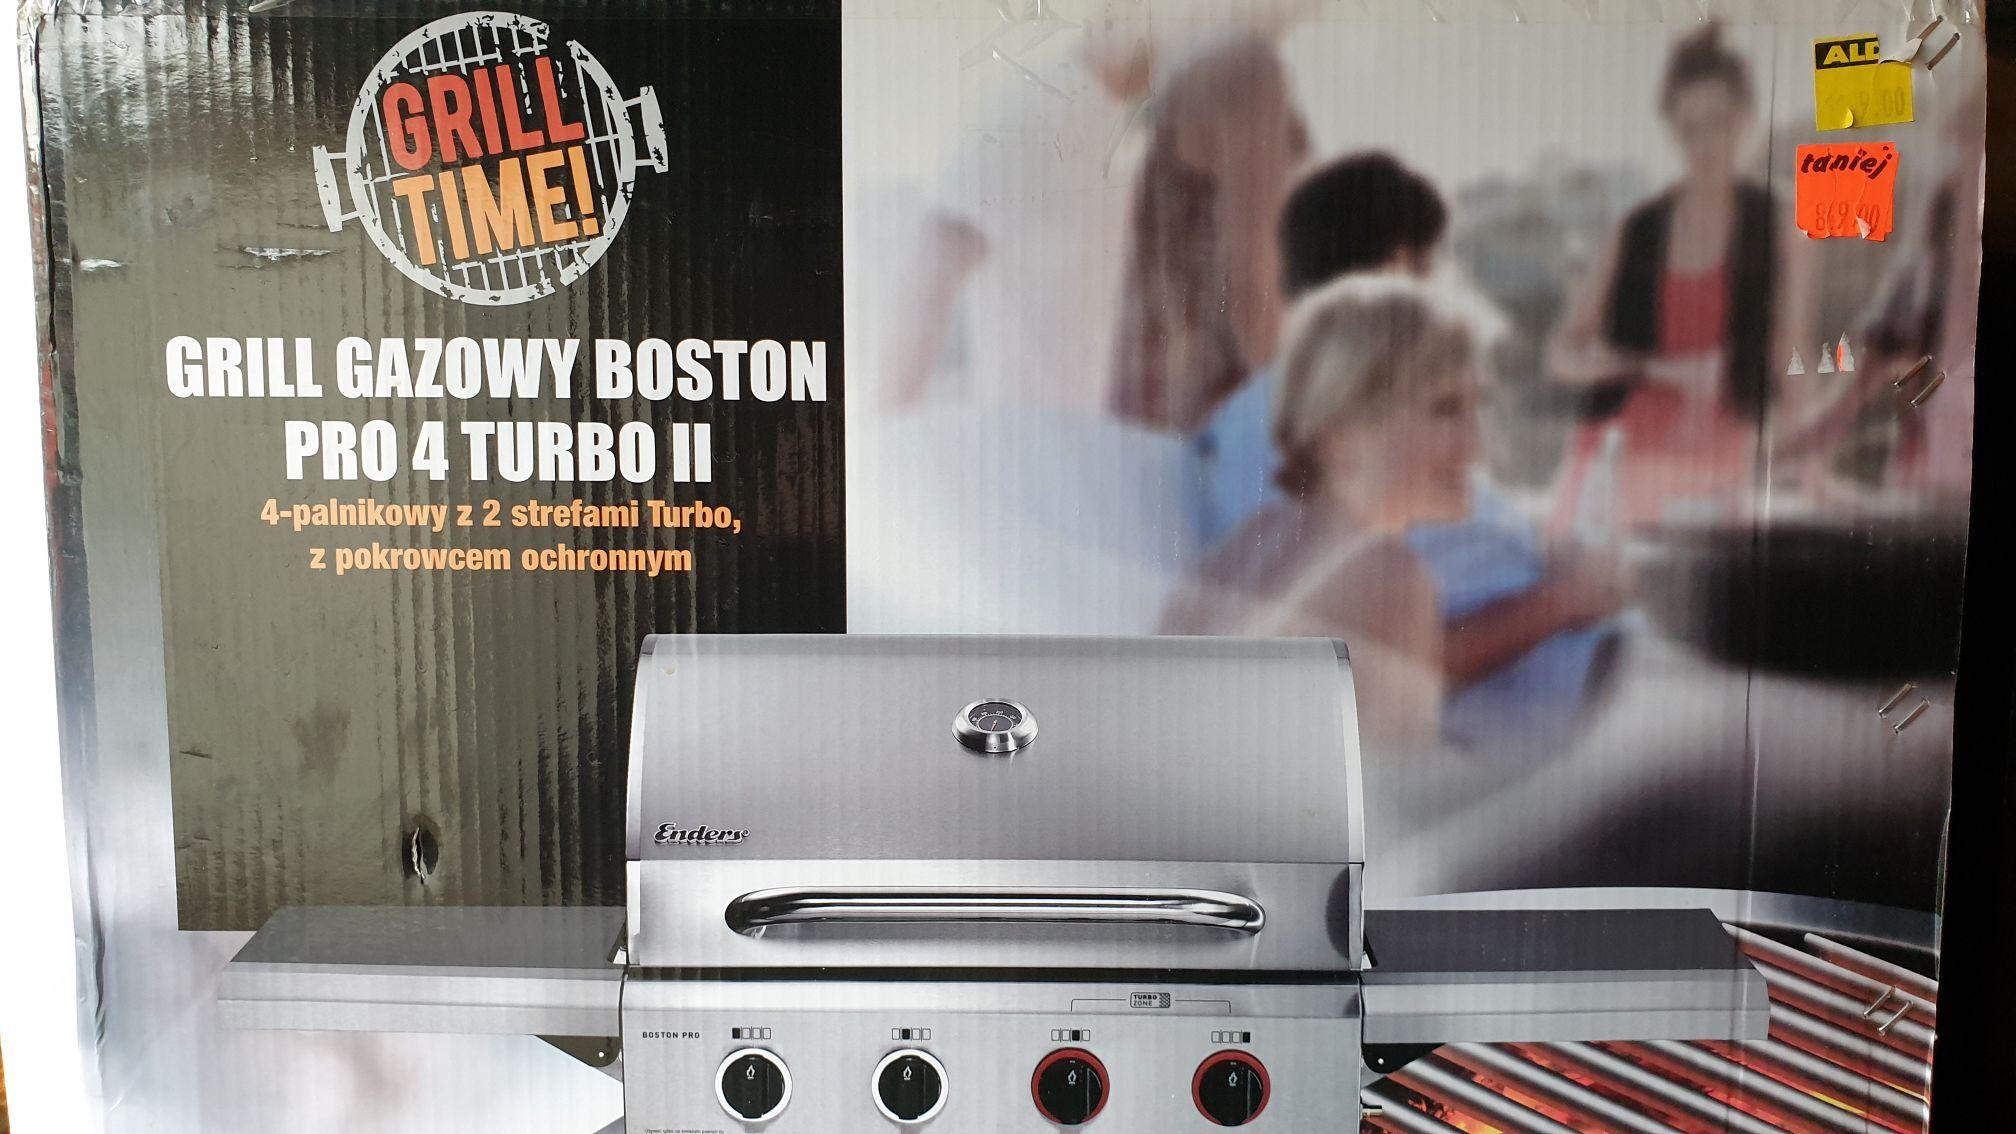 Grill gazowy Enders - Boston pro 4 turbo II